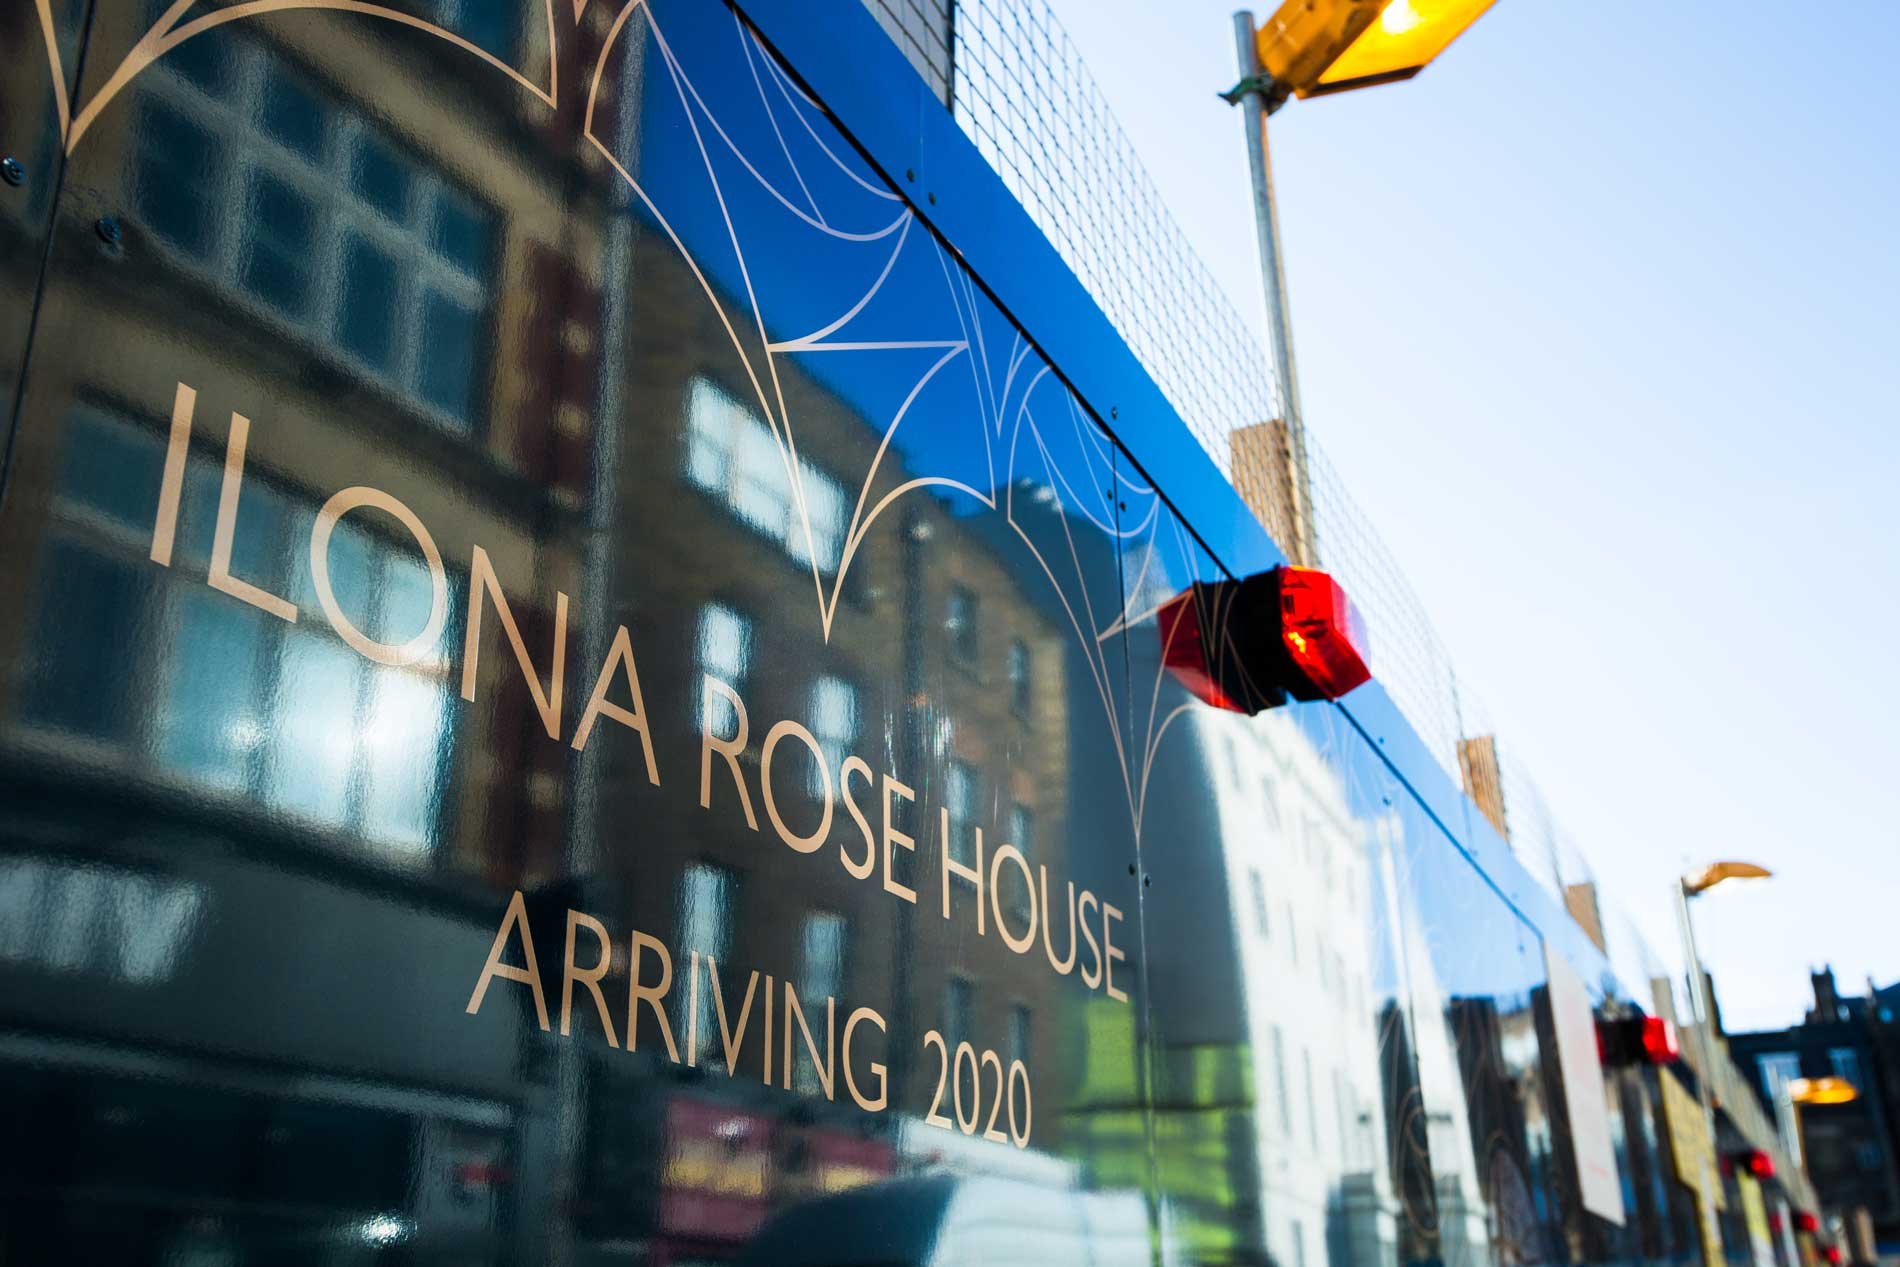 LRIlona-Rose-House-2018-007.jpg